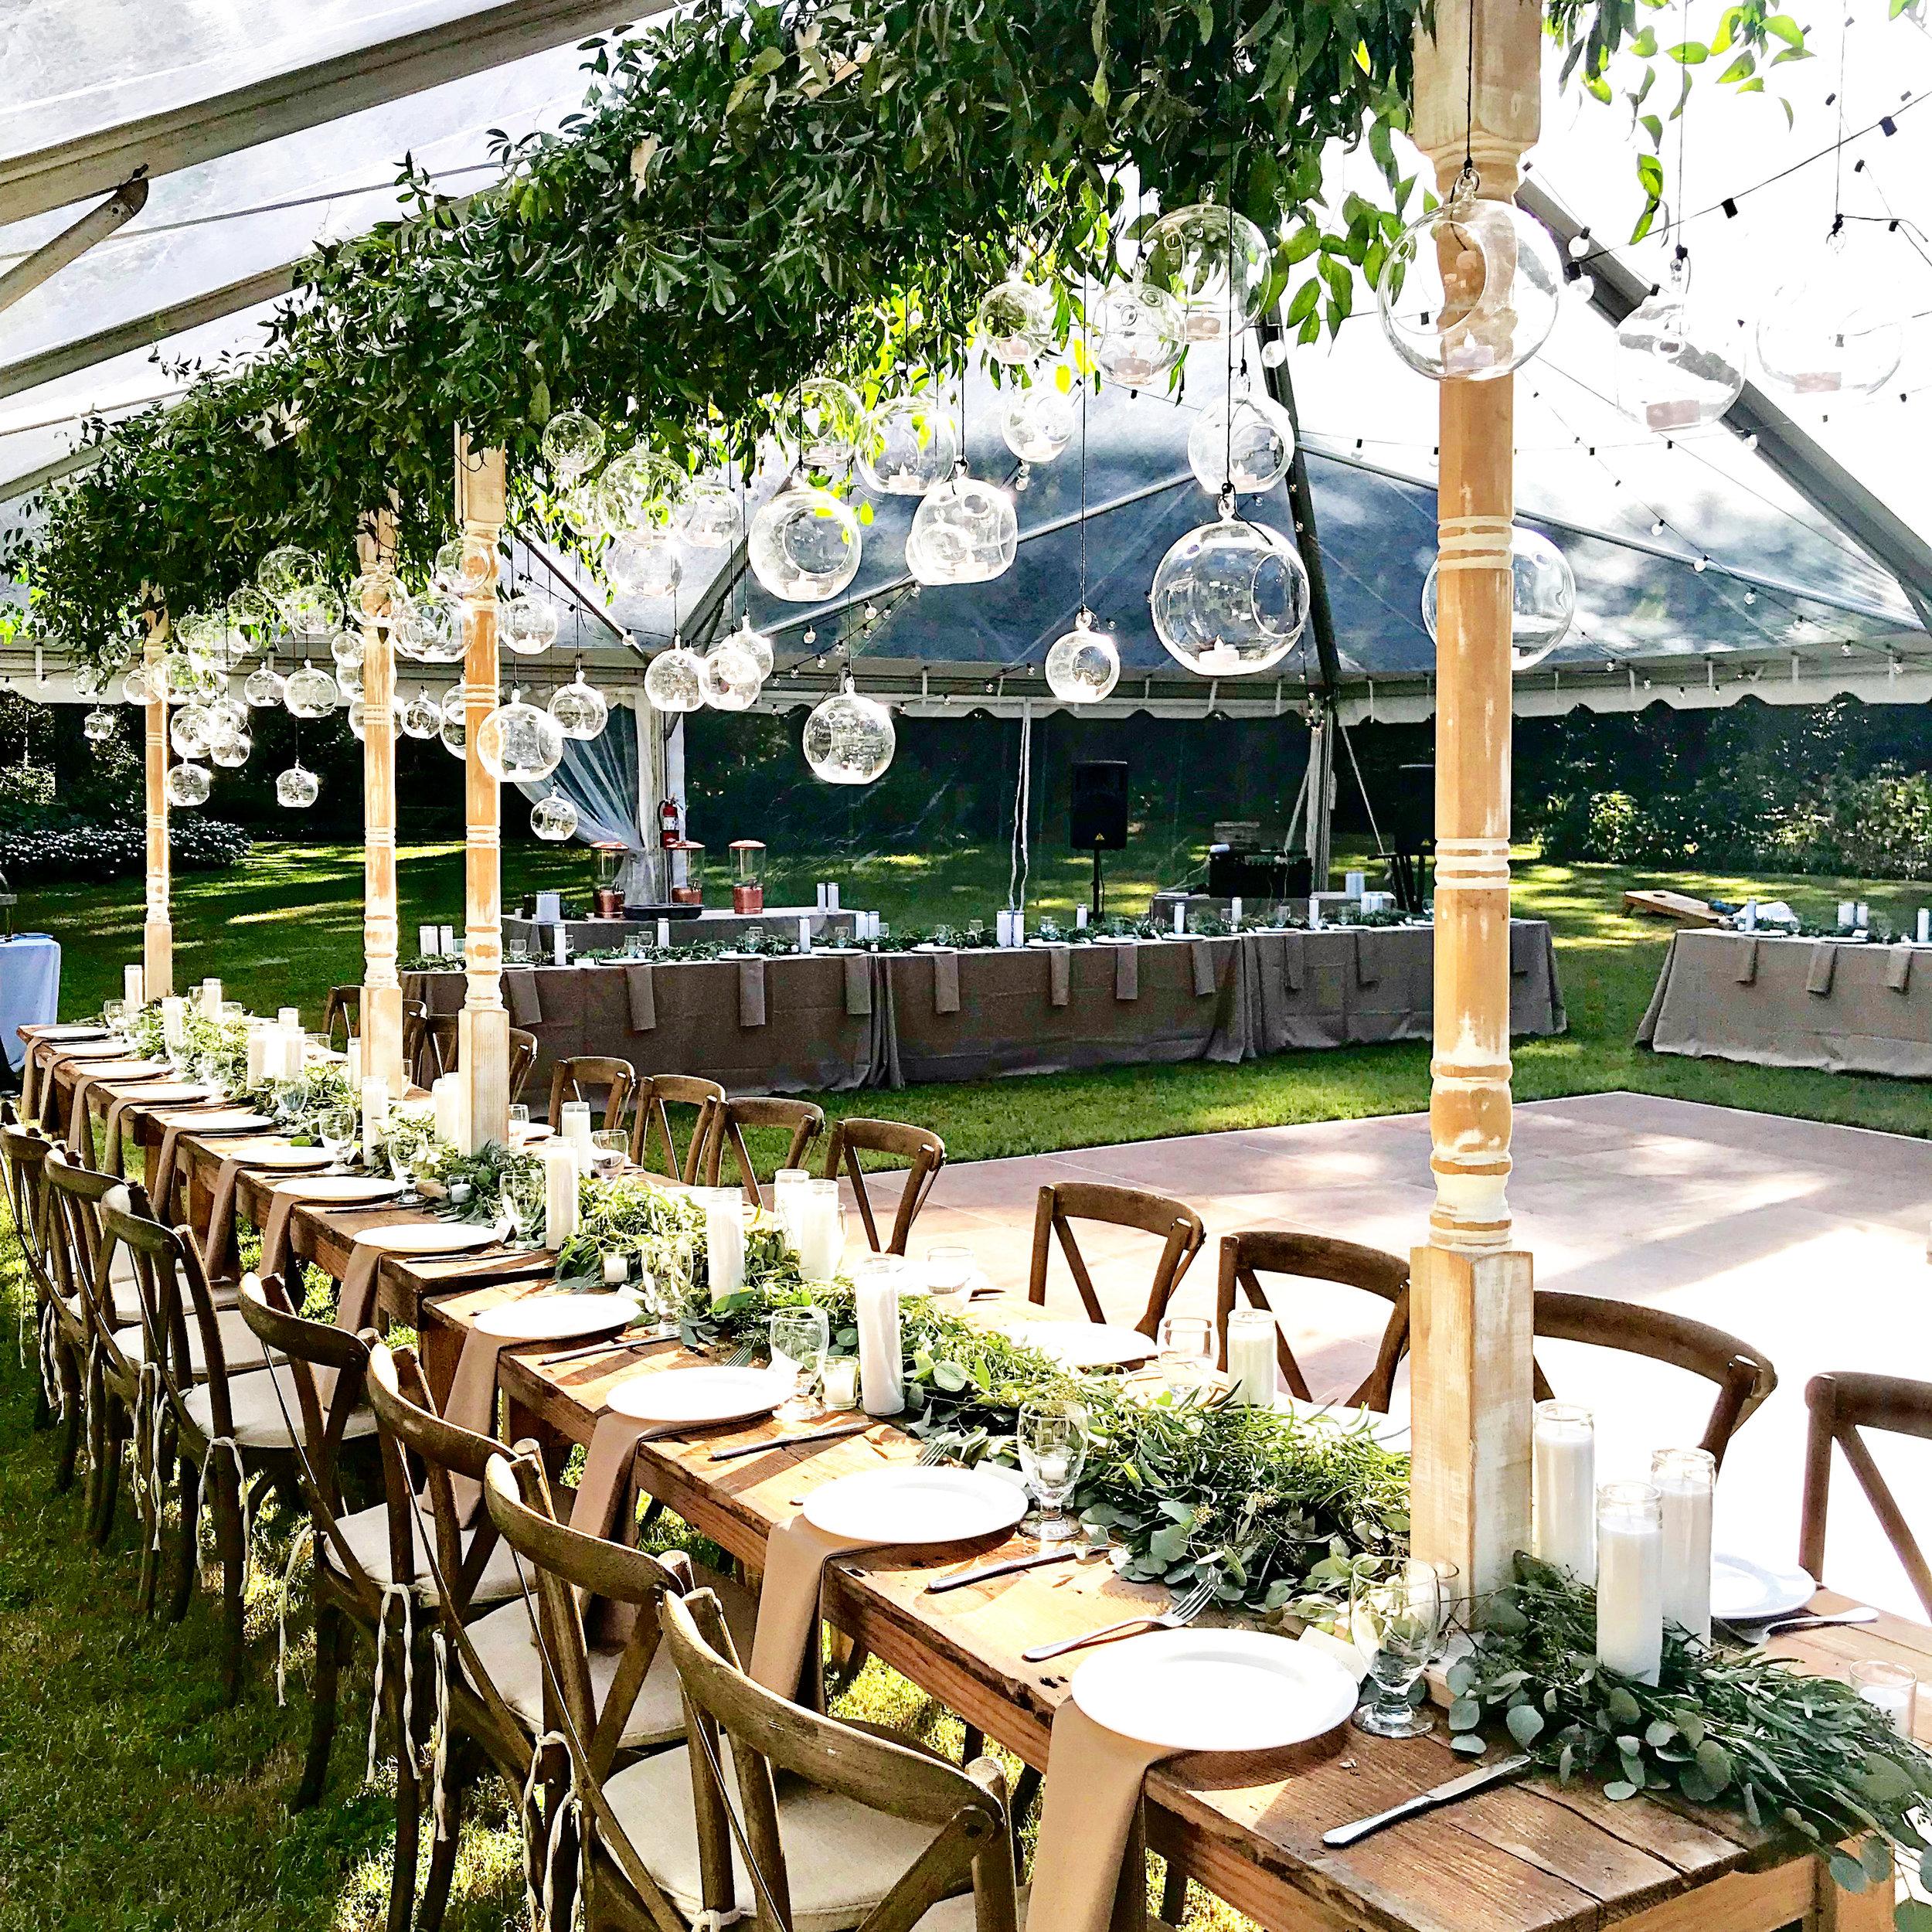 renee landry events lighting glass globe hanging wedding decor reception greenery candles boho rentals.jpg